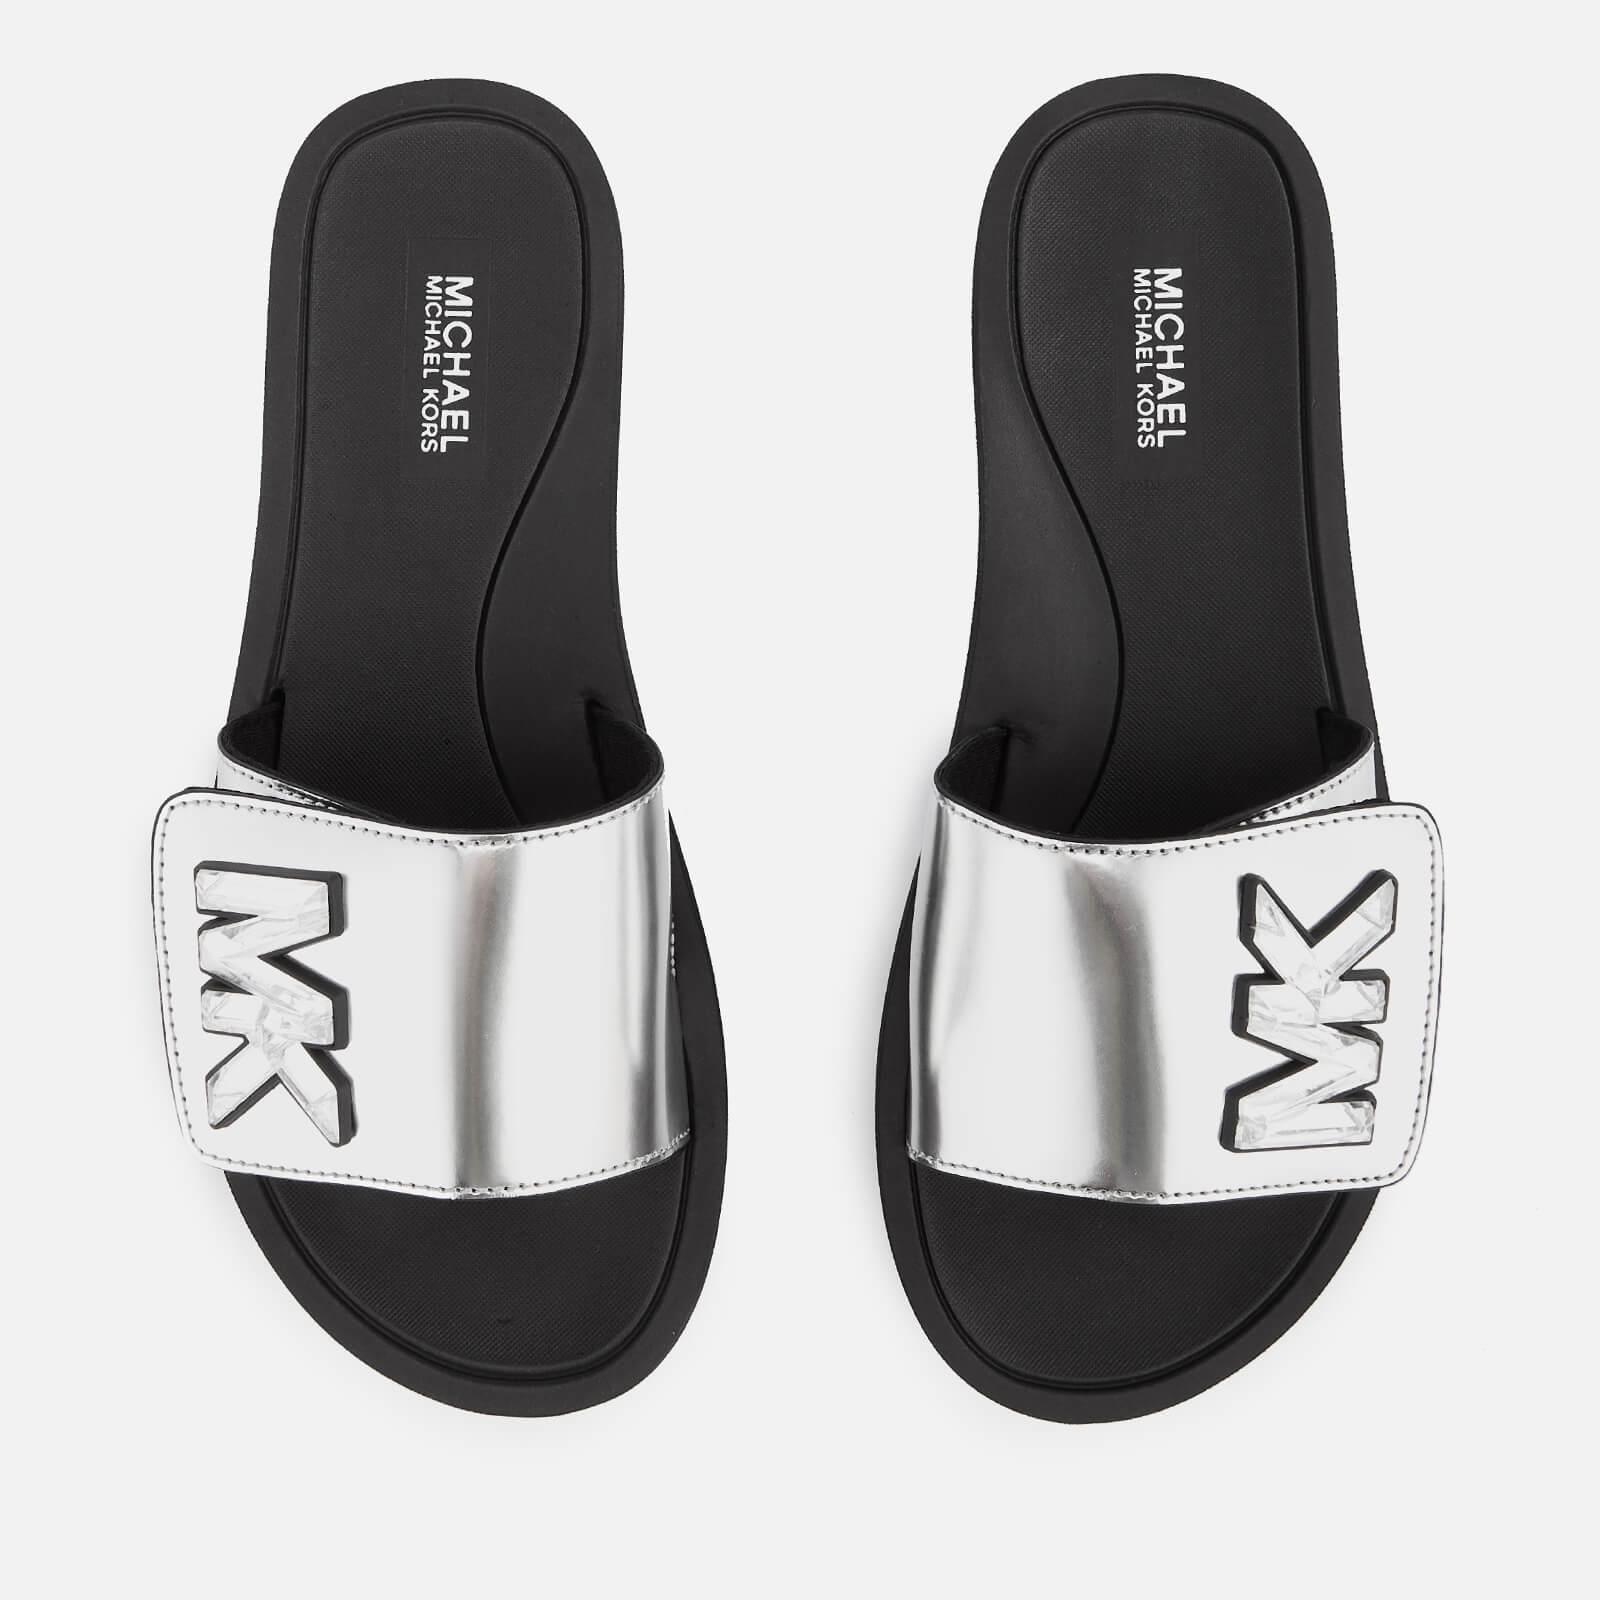 MICHAEL MICHAEL KORS Women's MK Slide Sandals - Silver - UK 6/US 9 - Silver